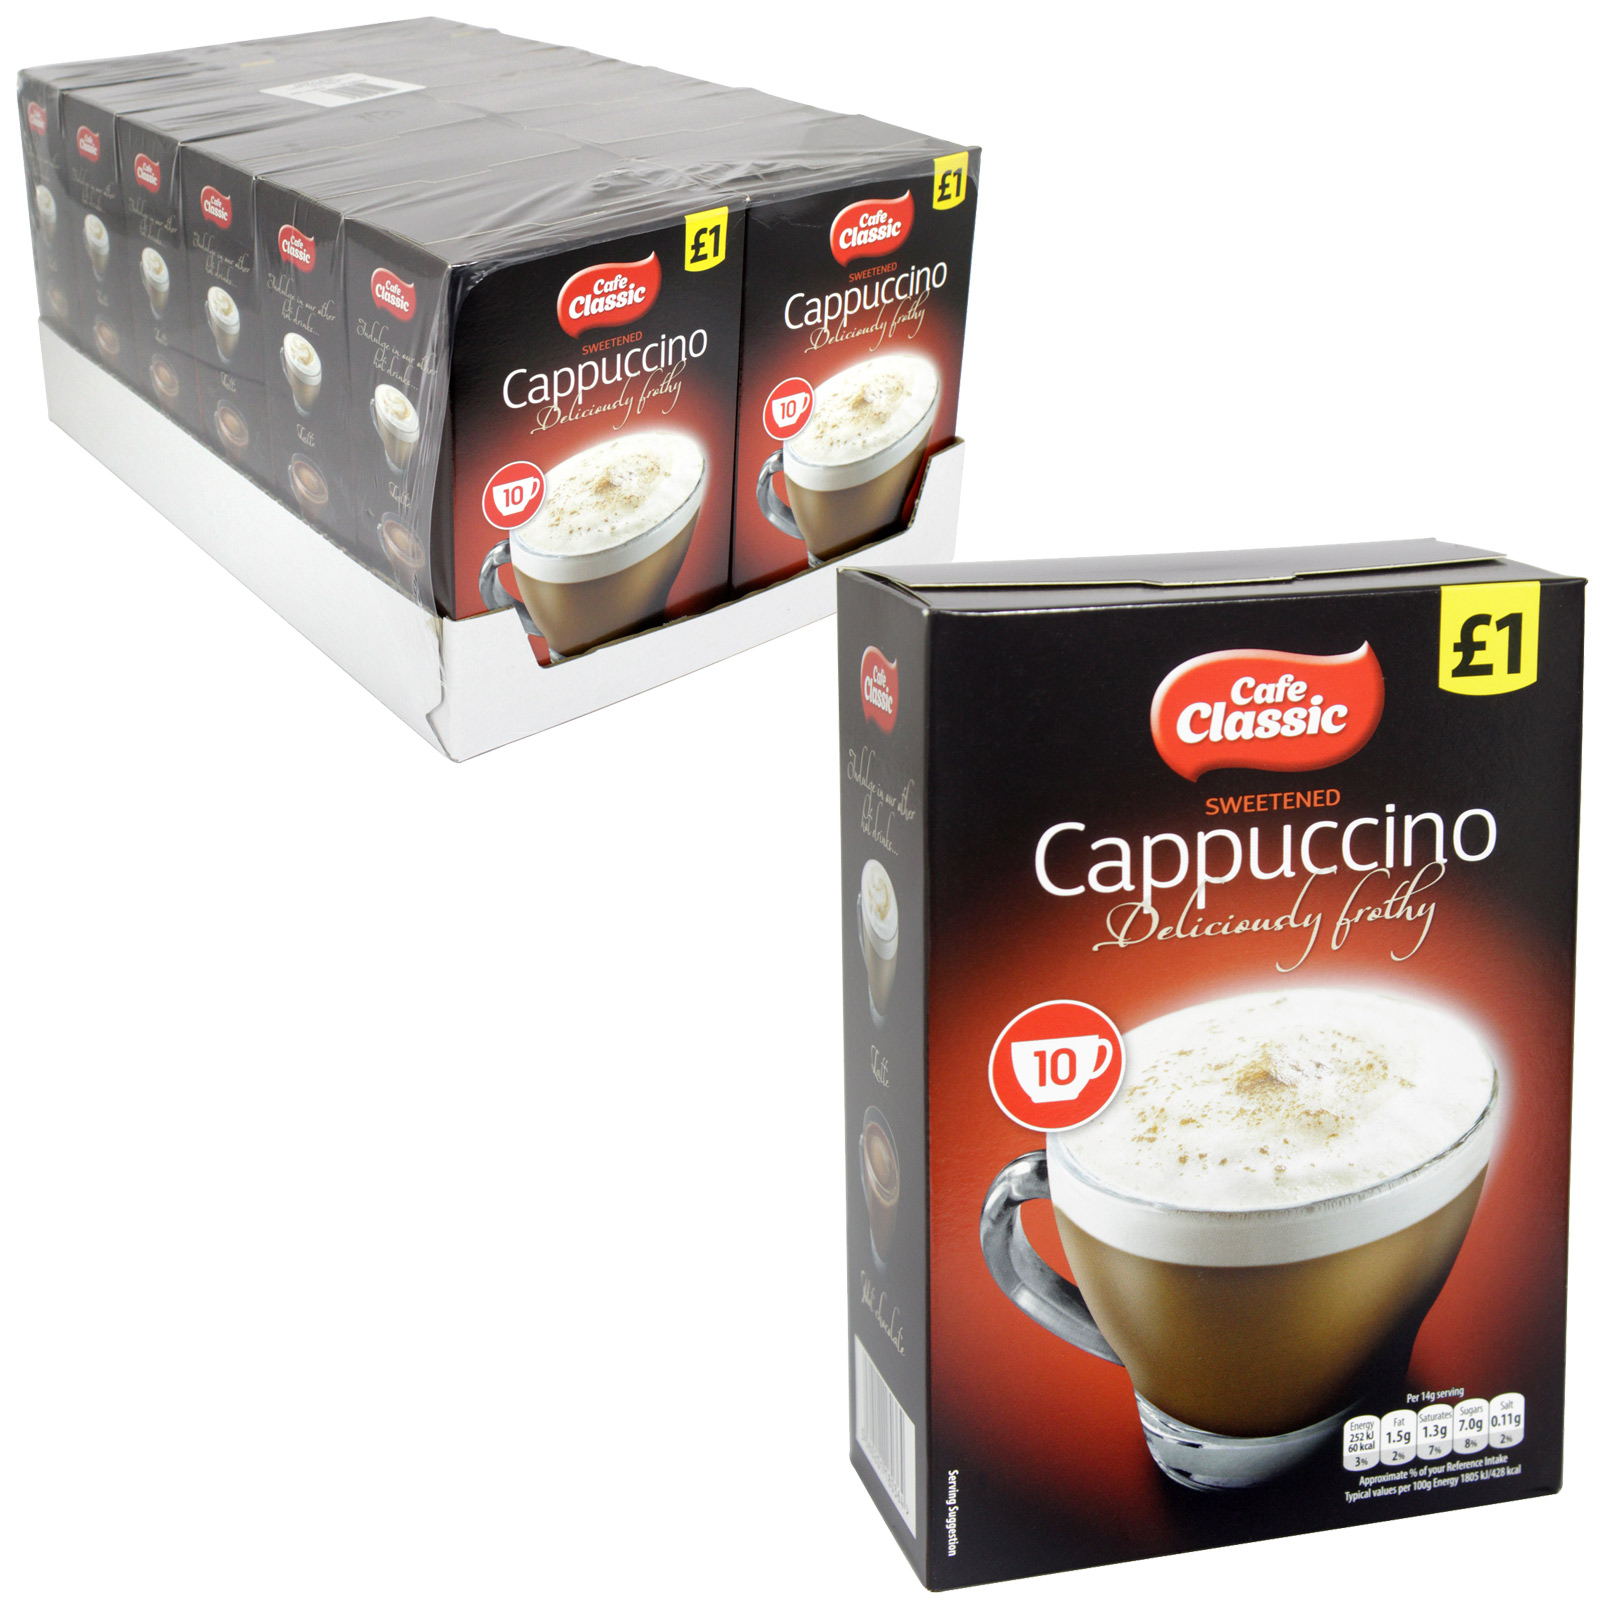 CAFE CLASSIC CAPPUCCINO 10PK P/M ?1 X12